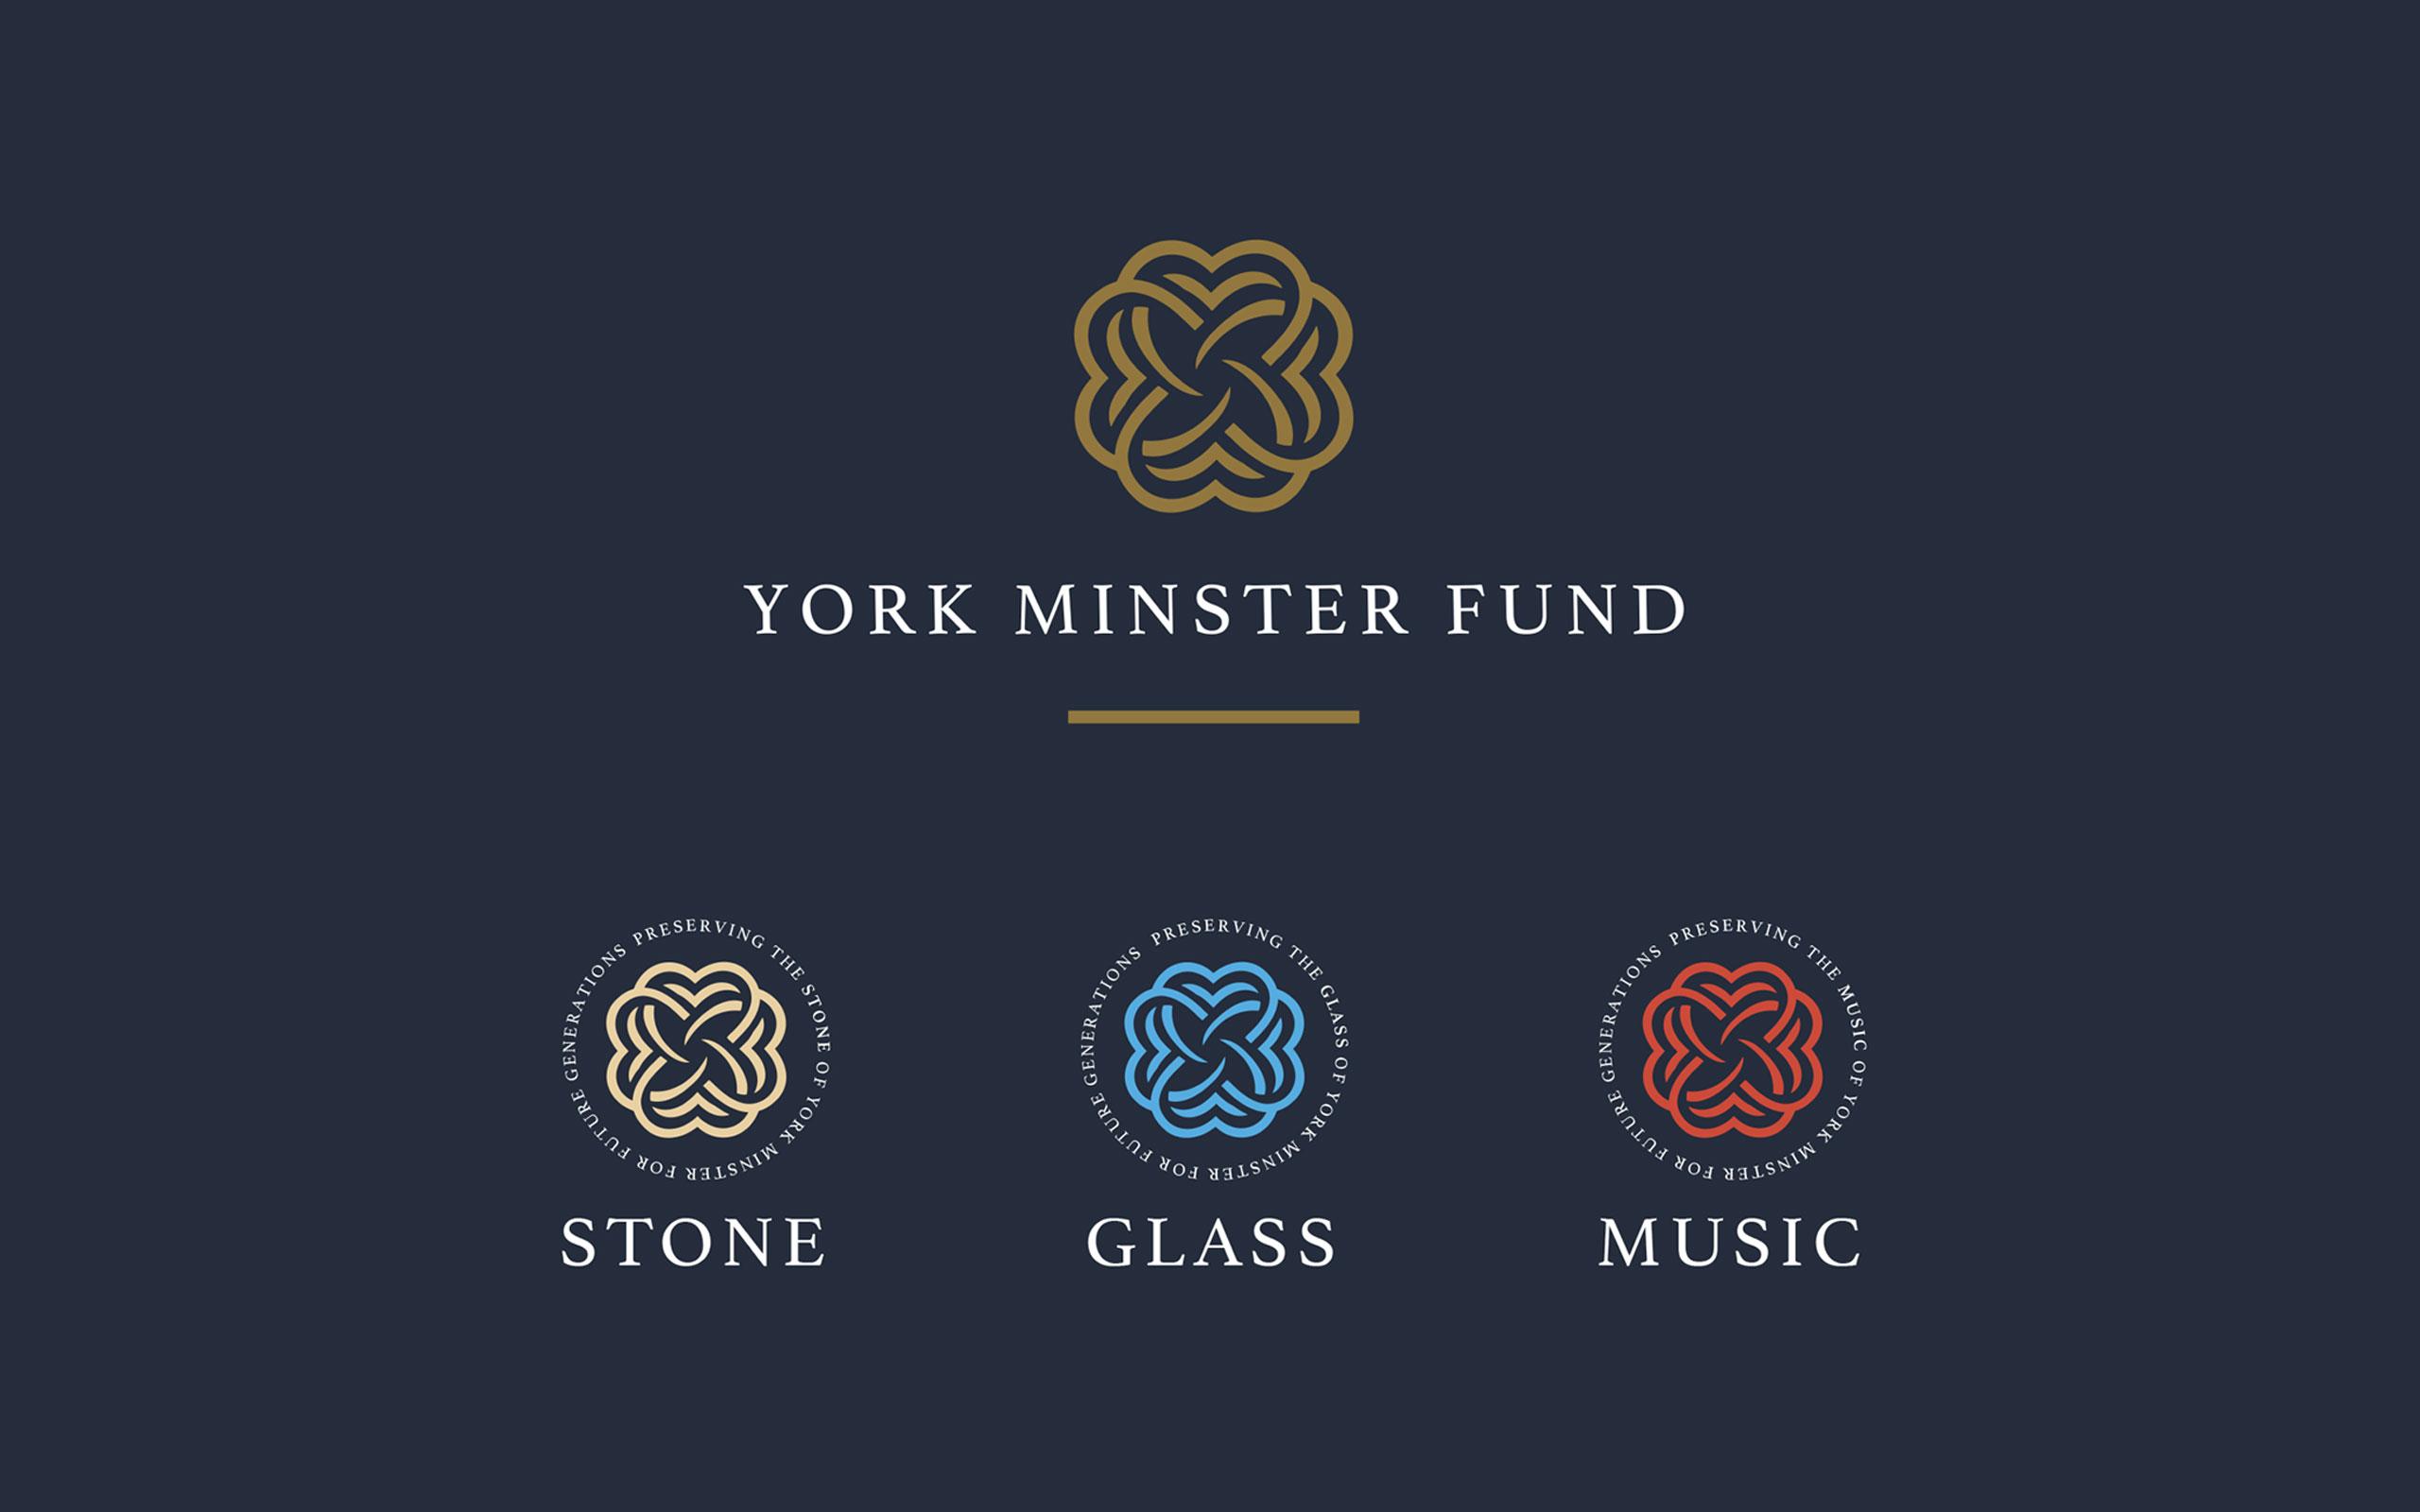 York_Minster_Fund_Development_Sub_Brands_Yorkshire_Heritage_Fund_Raising